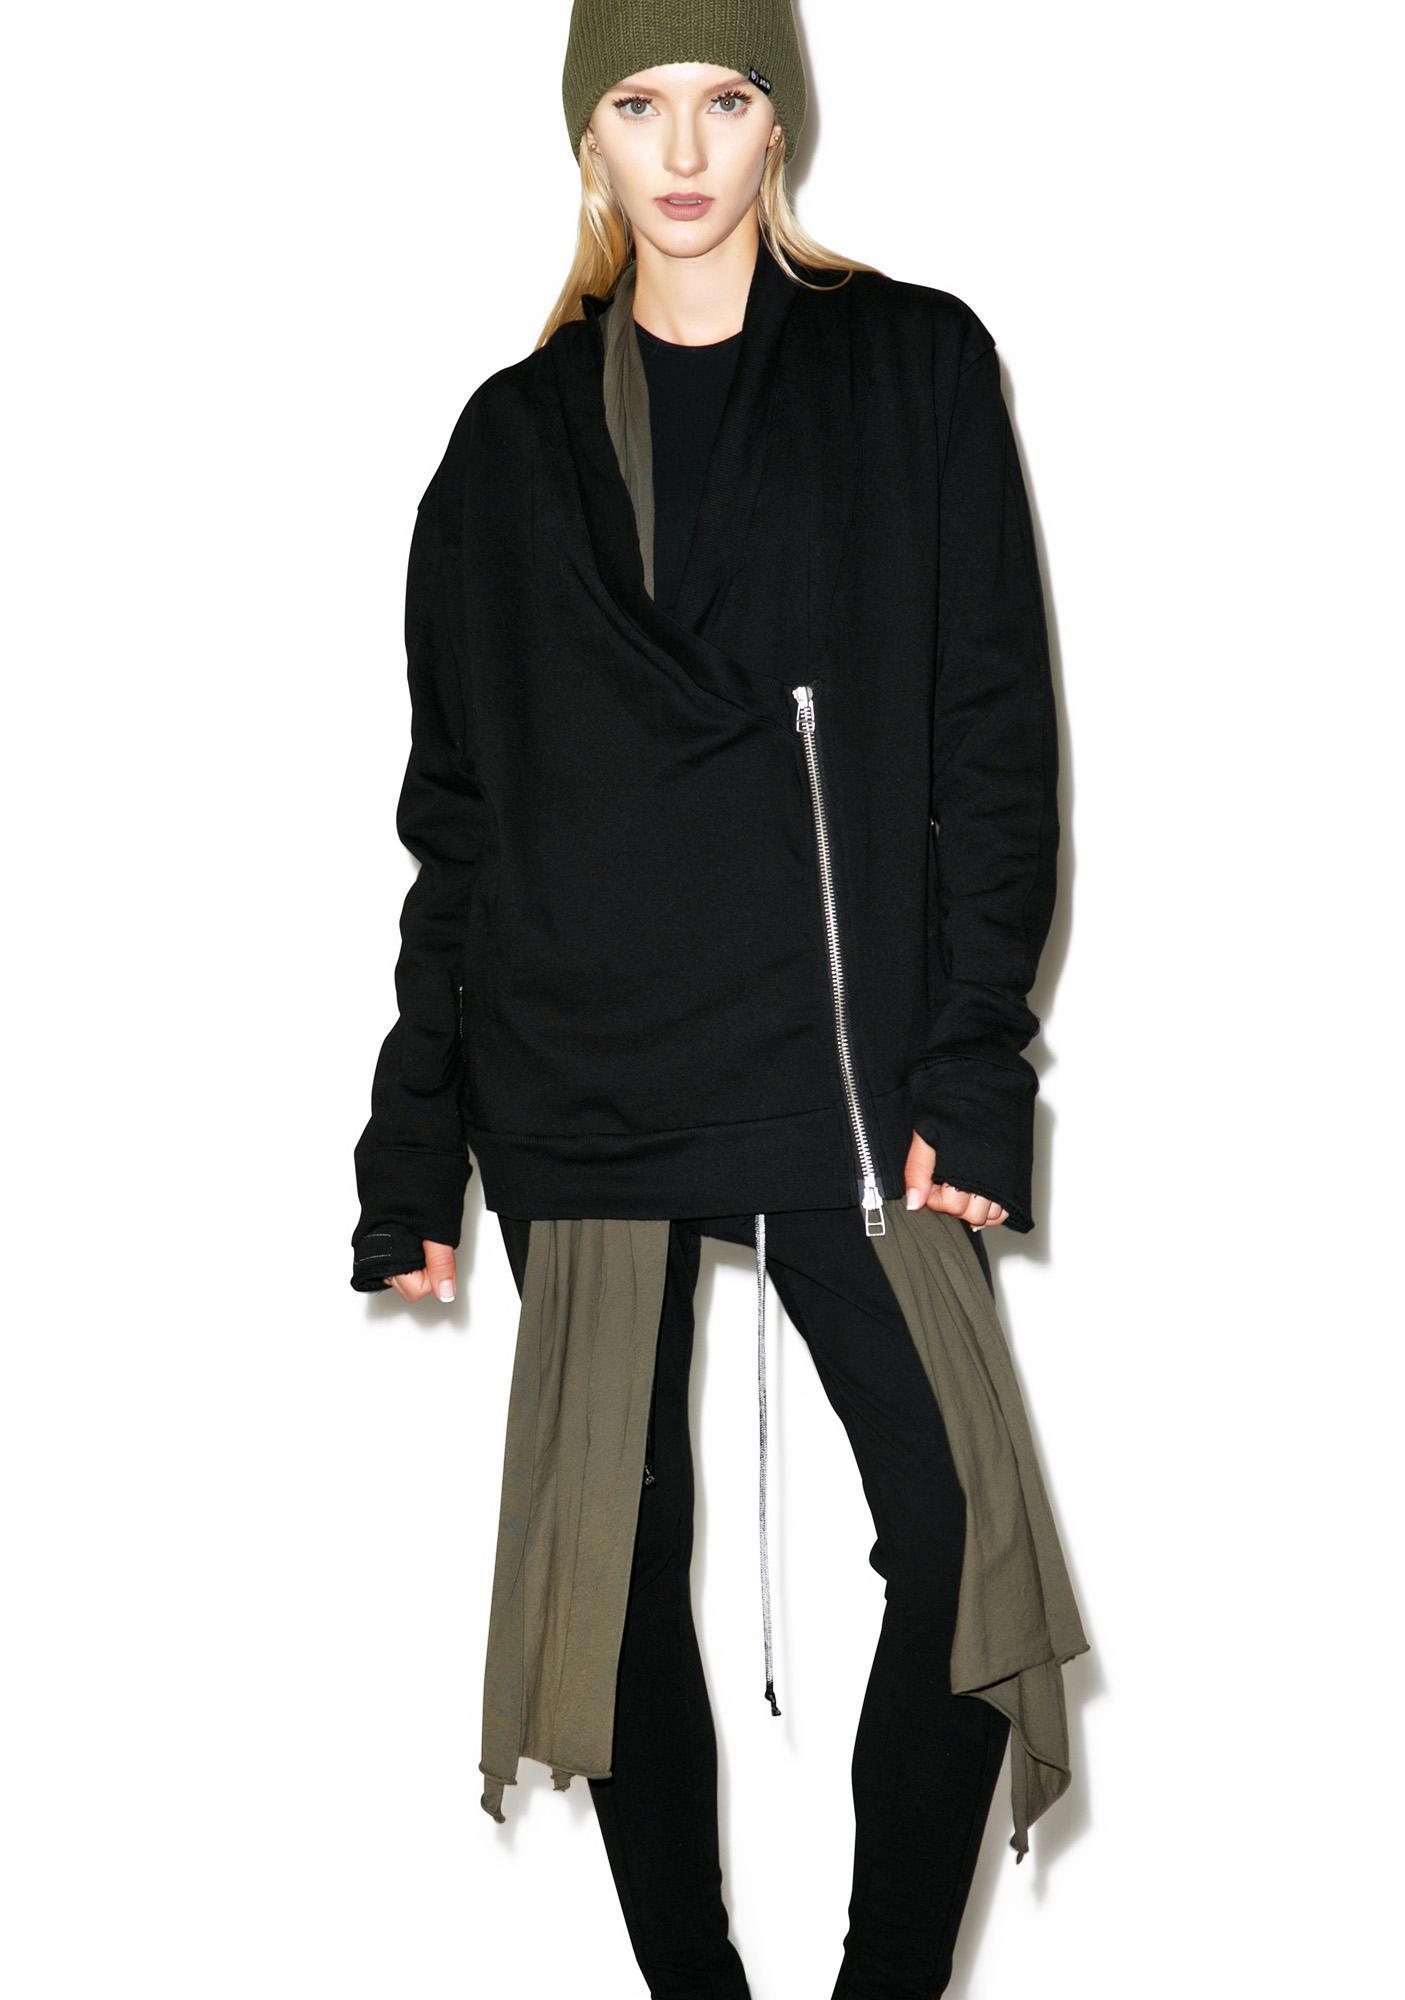 Knomadik Knomad Kimono Sweatshirt